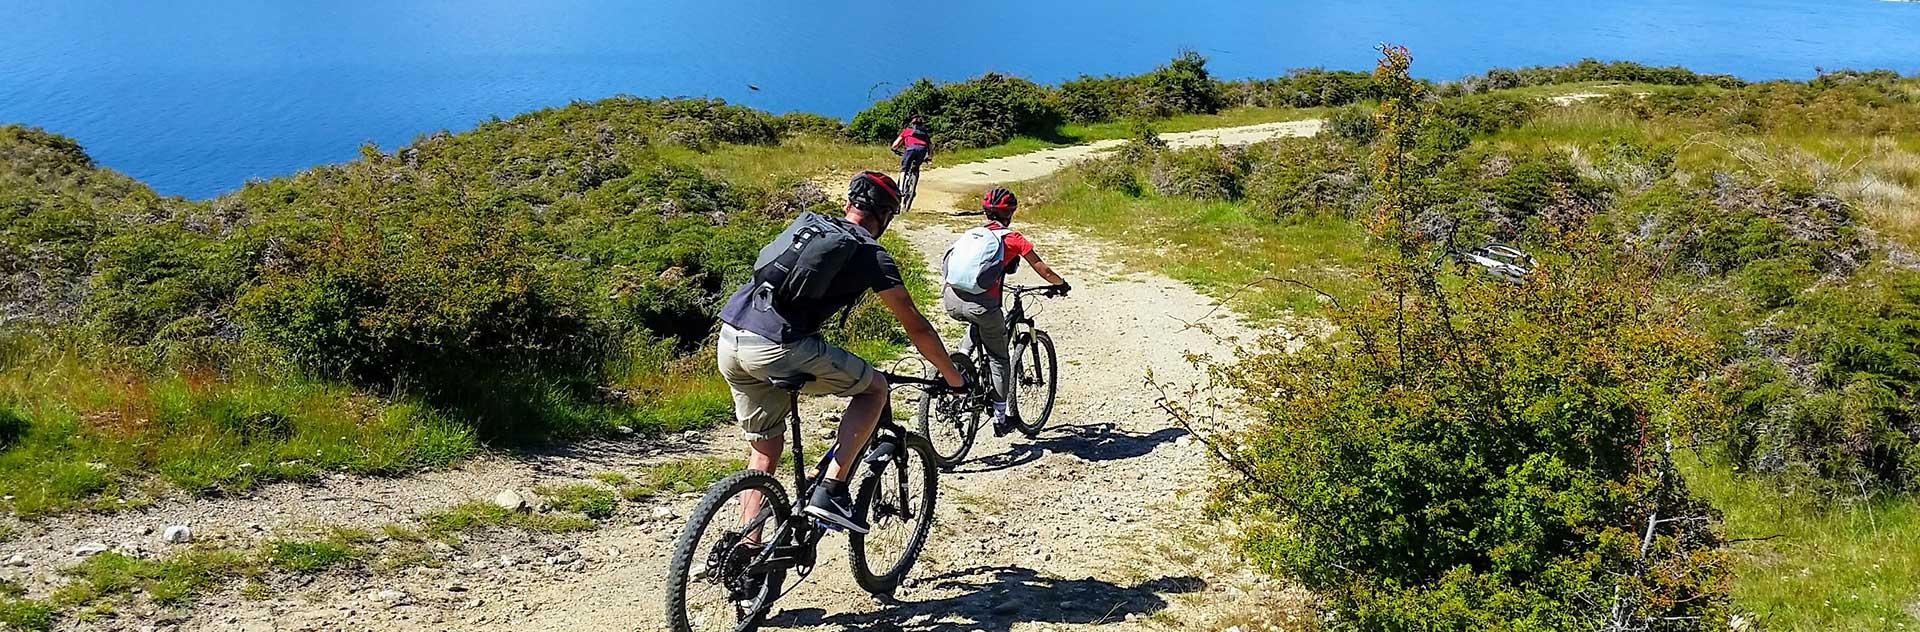 Bike + Boat Tour | Discover Wanaka | Guided Tours